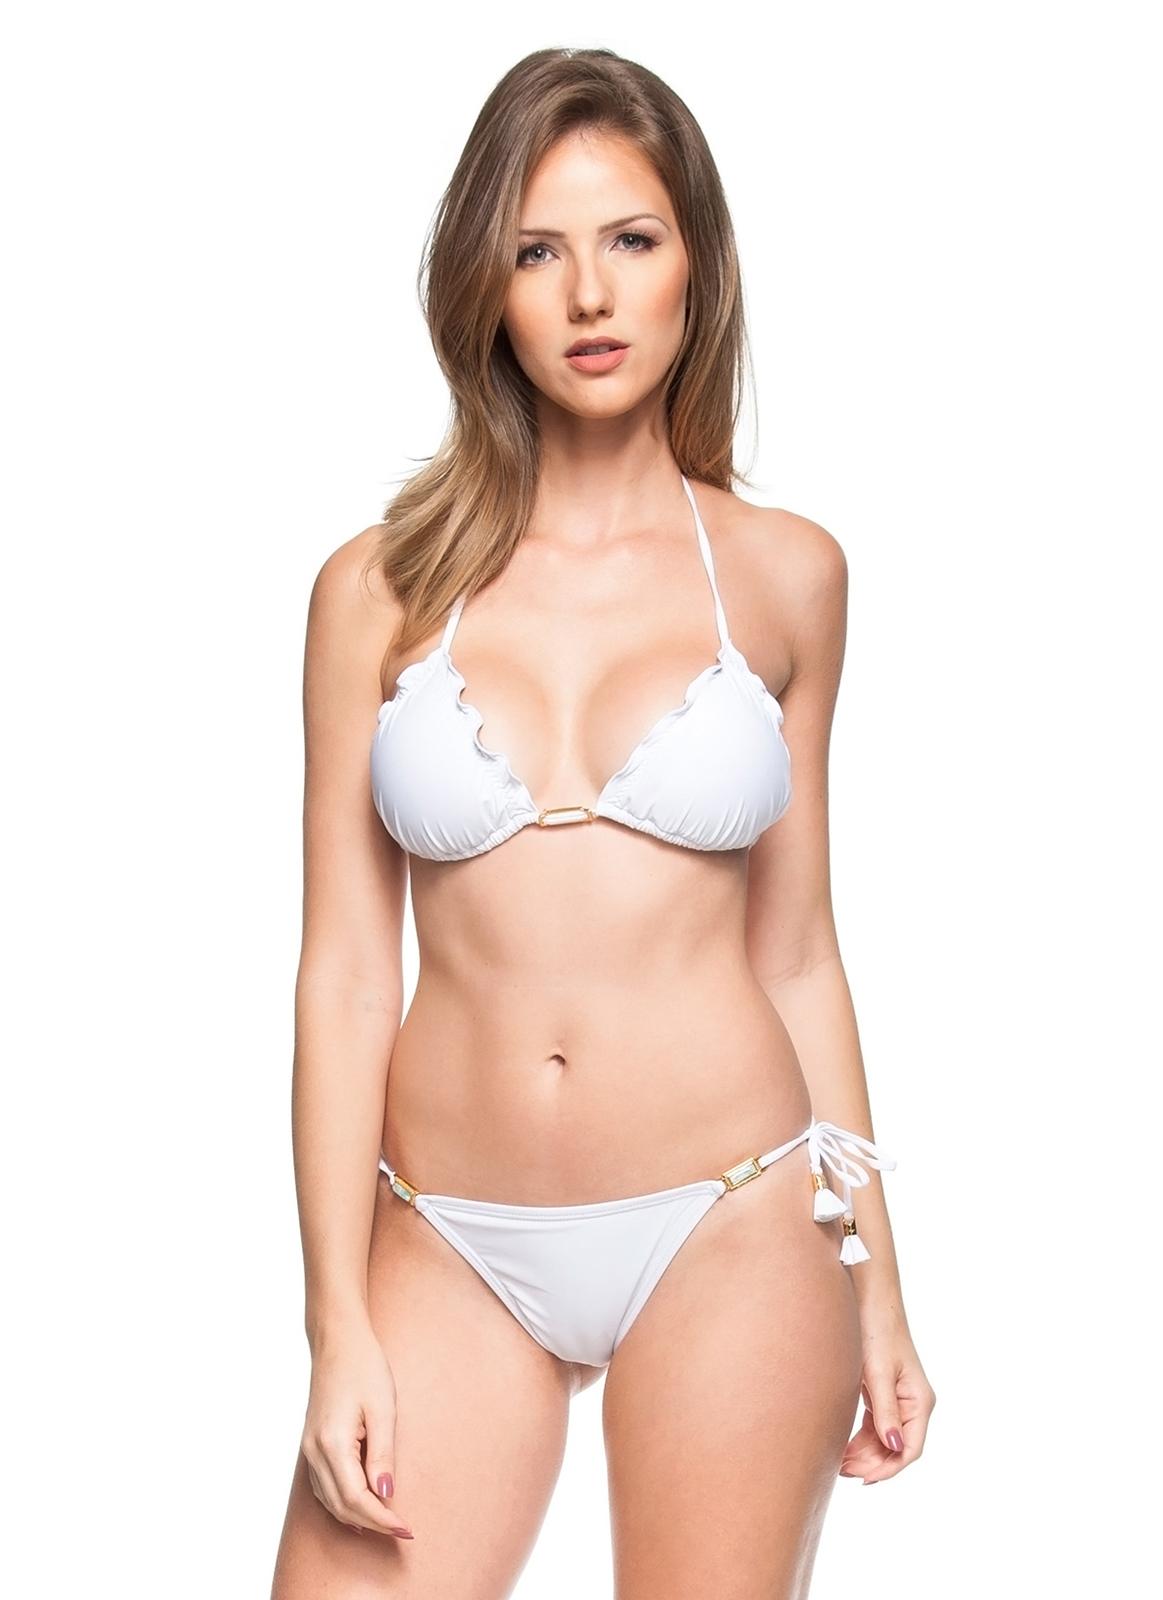 White Scrunch Bikini With Pompons And Jewelry